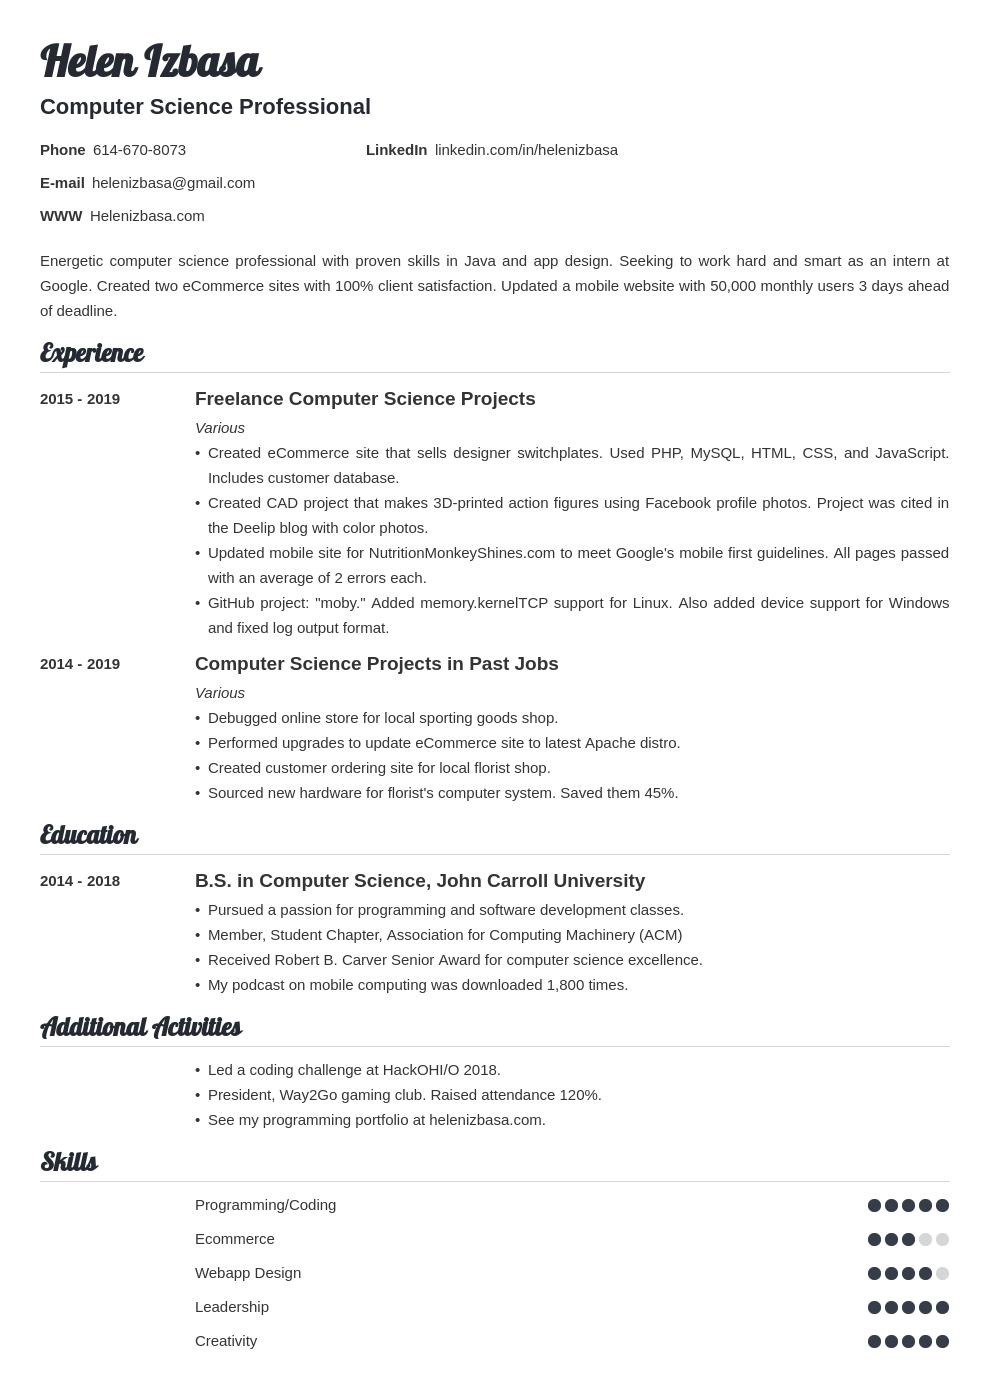 internship template valera uk